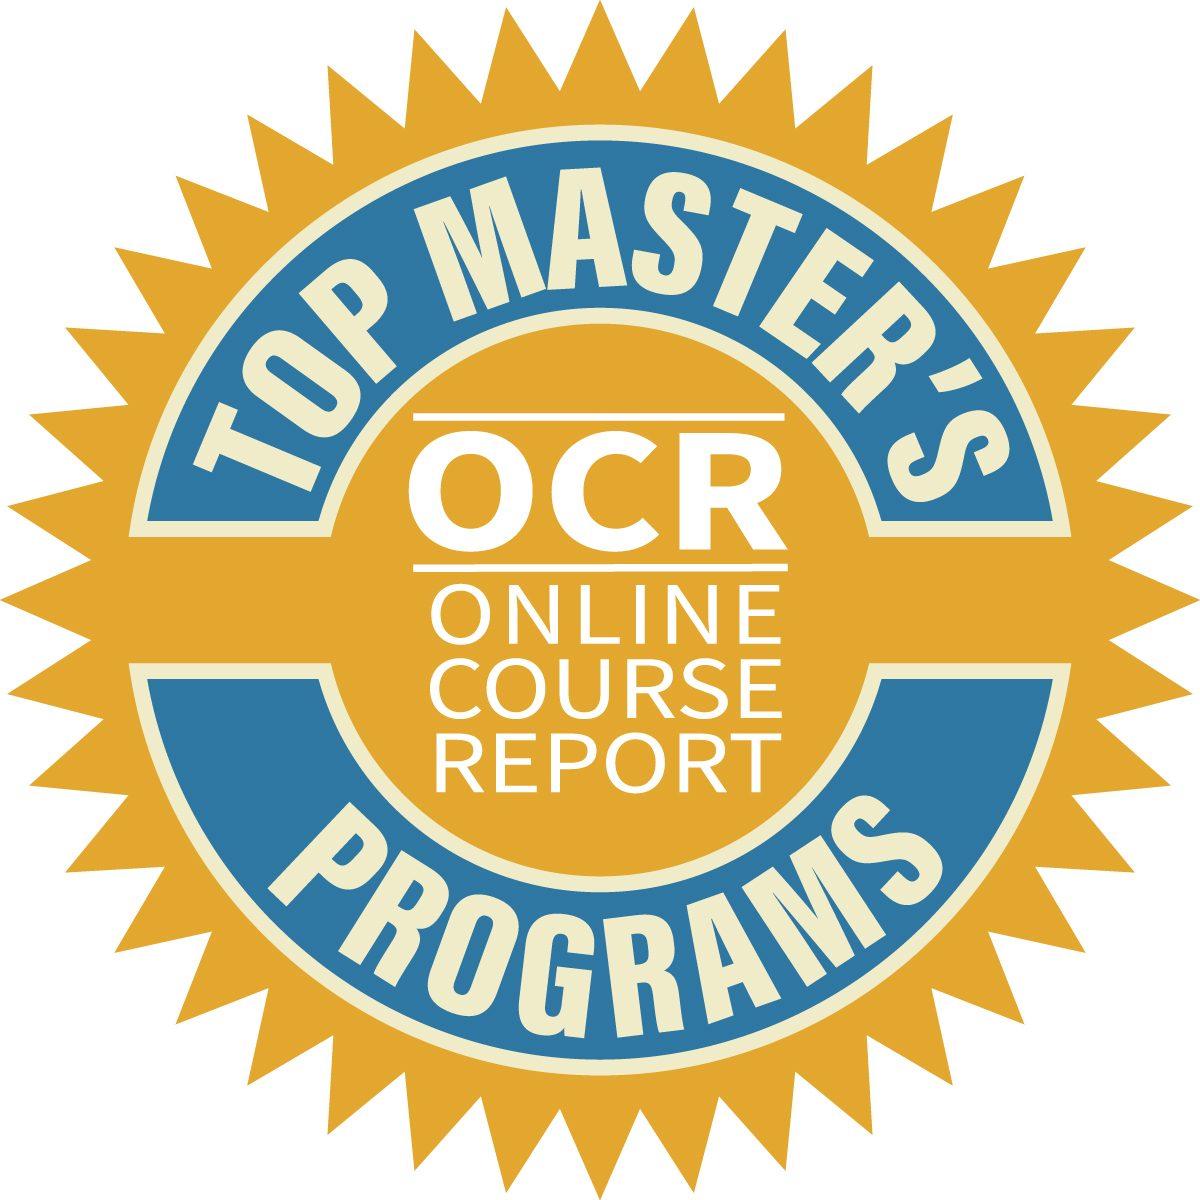 Online Course Report's Top Master's Programs